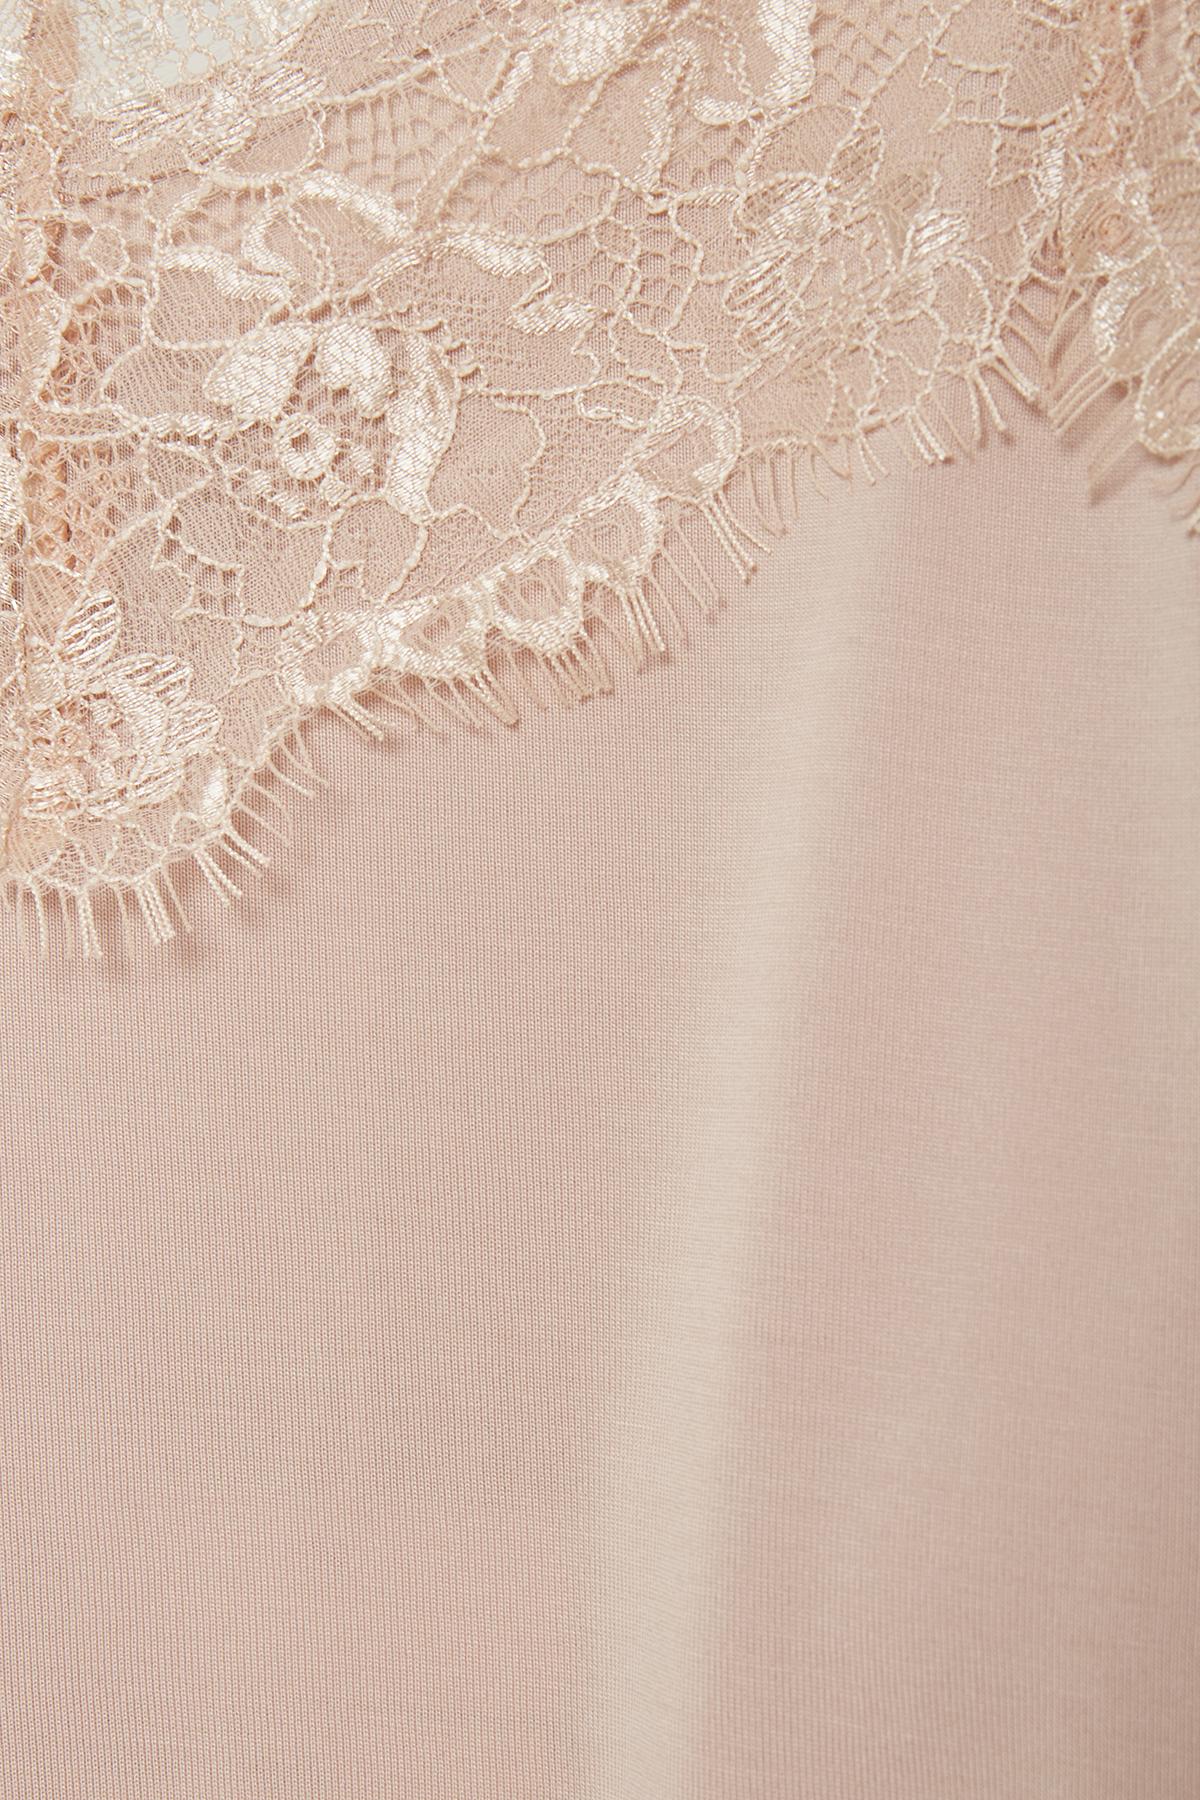 Rose Dust Jerseytop – Køb Rose Dust Jerseytop fra str. XS-XXL her